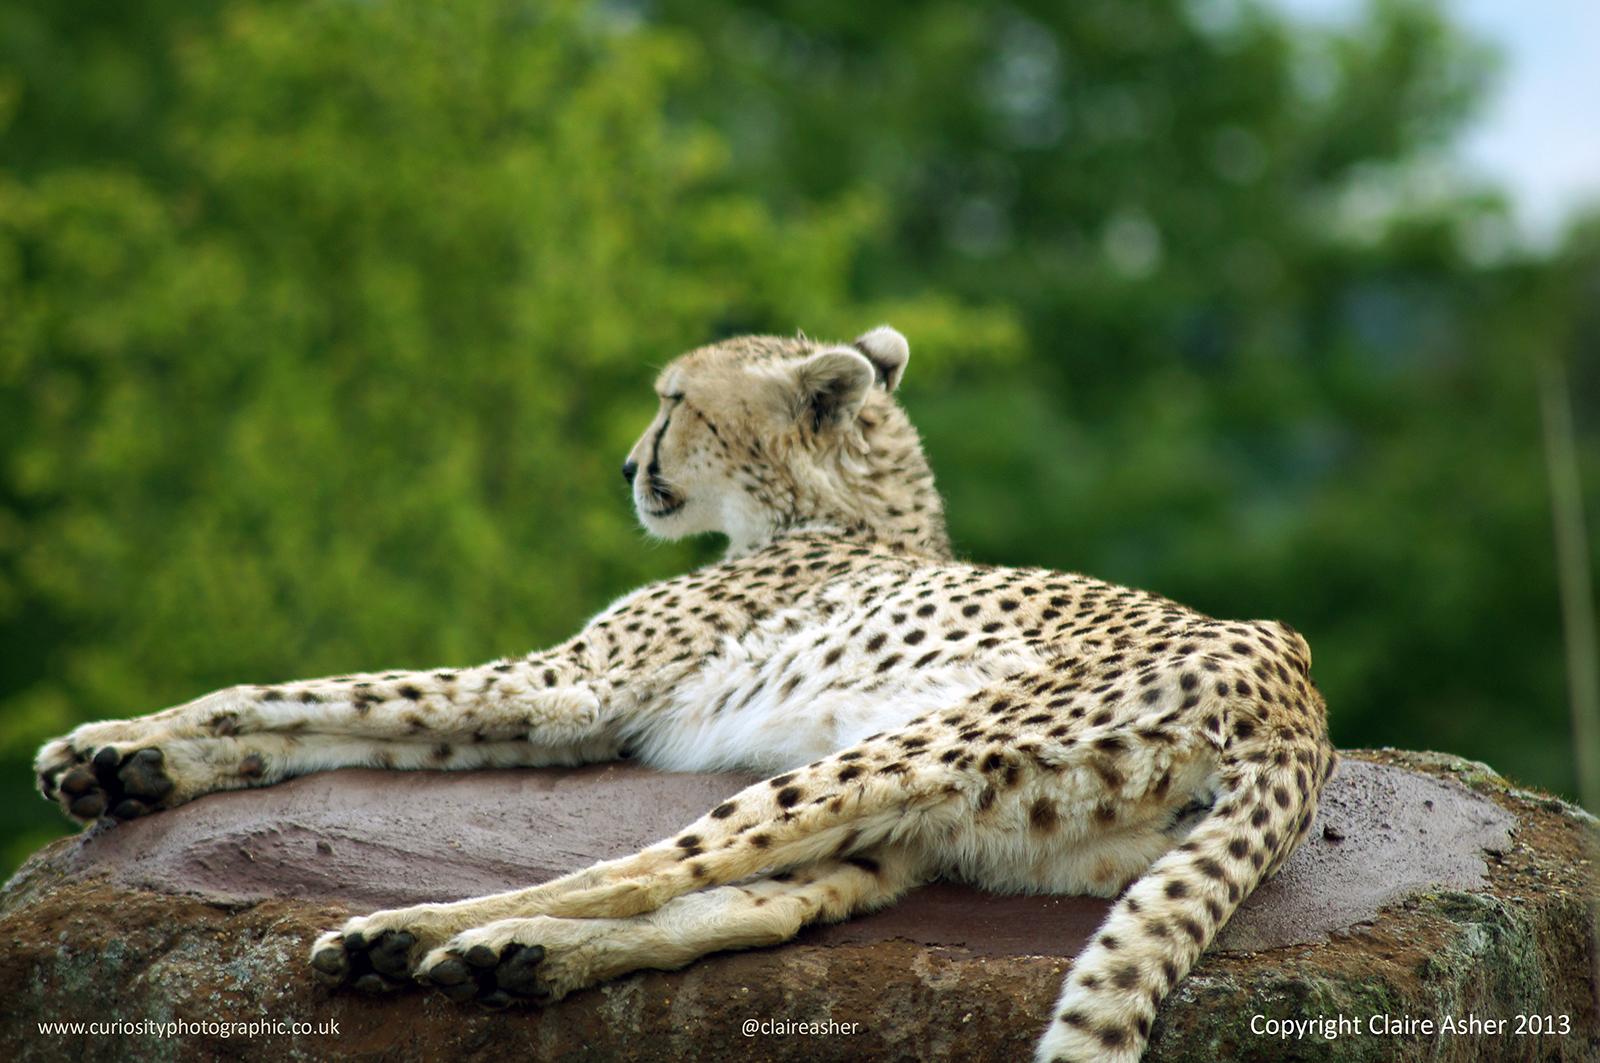 Cheetah (Acinonyx jubatus) photographed in captivity in the UK in 2013